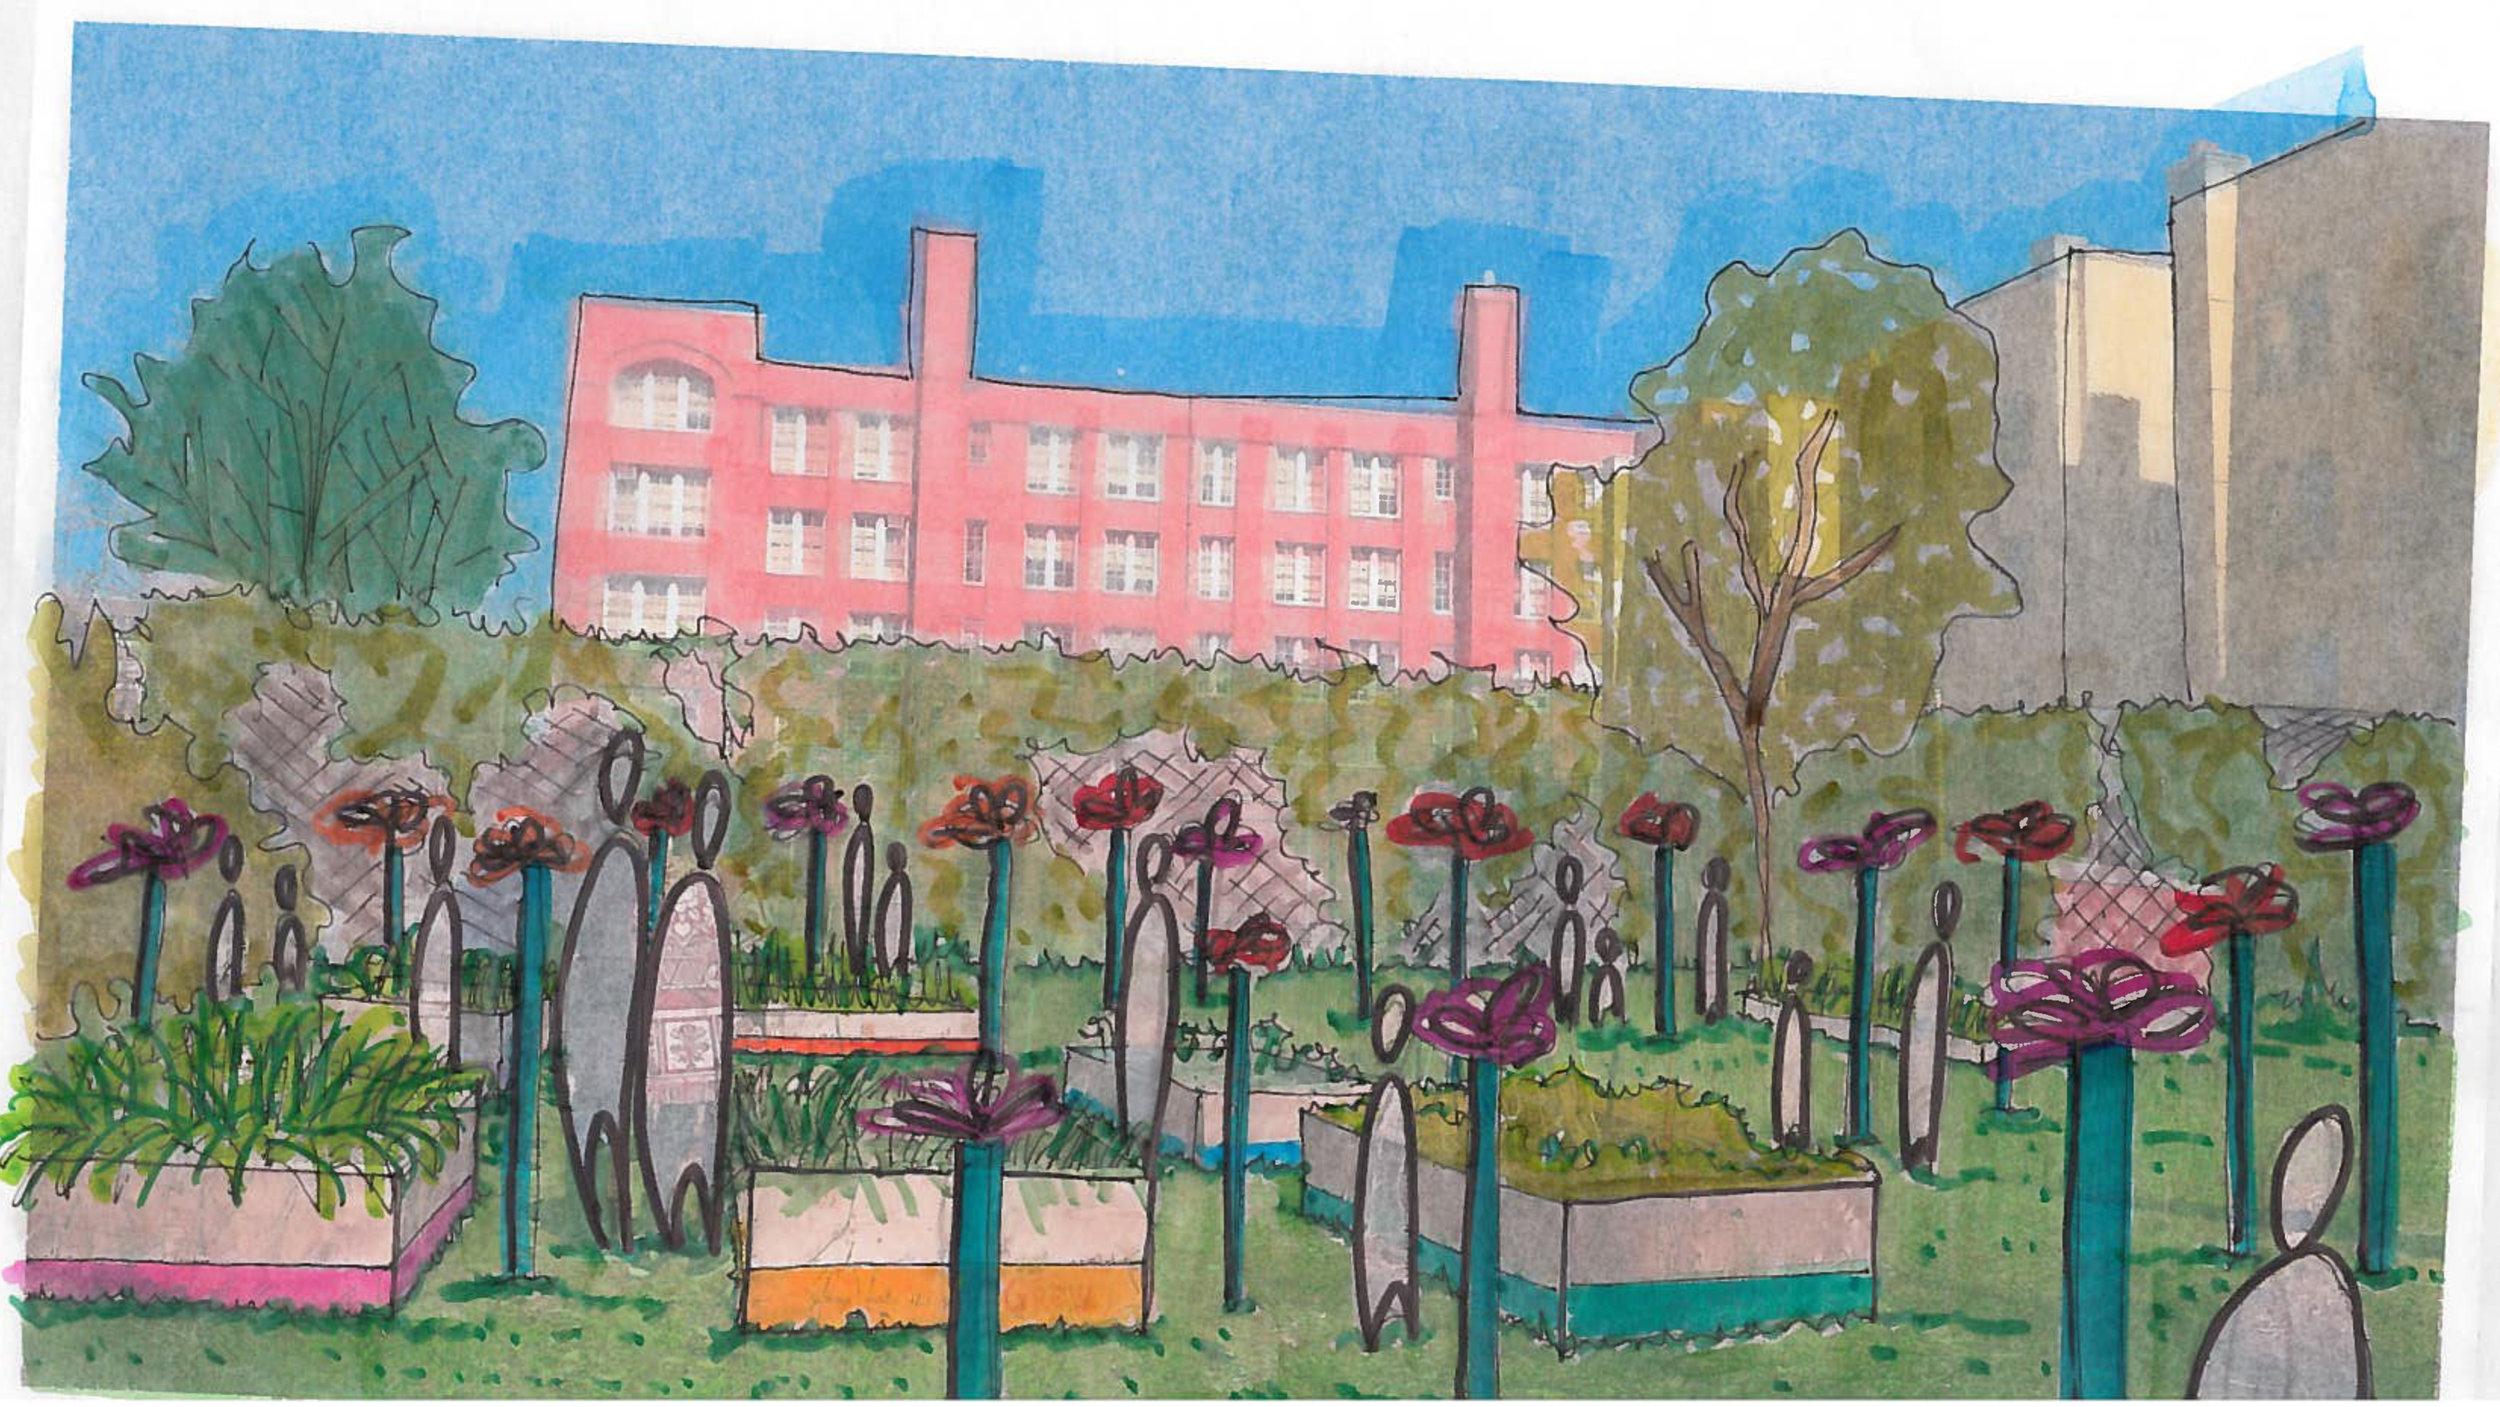 ArtsENY - CivLab_paul's garden copy 2.jpg